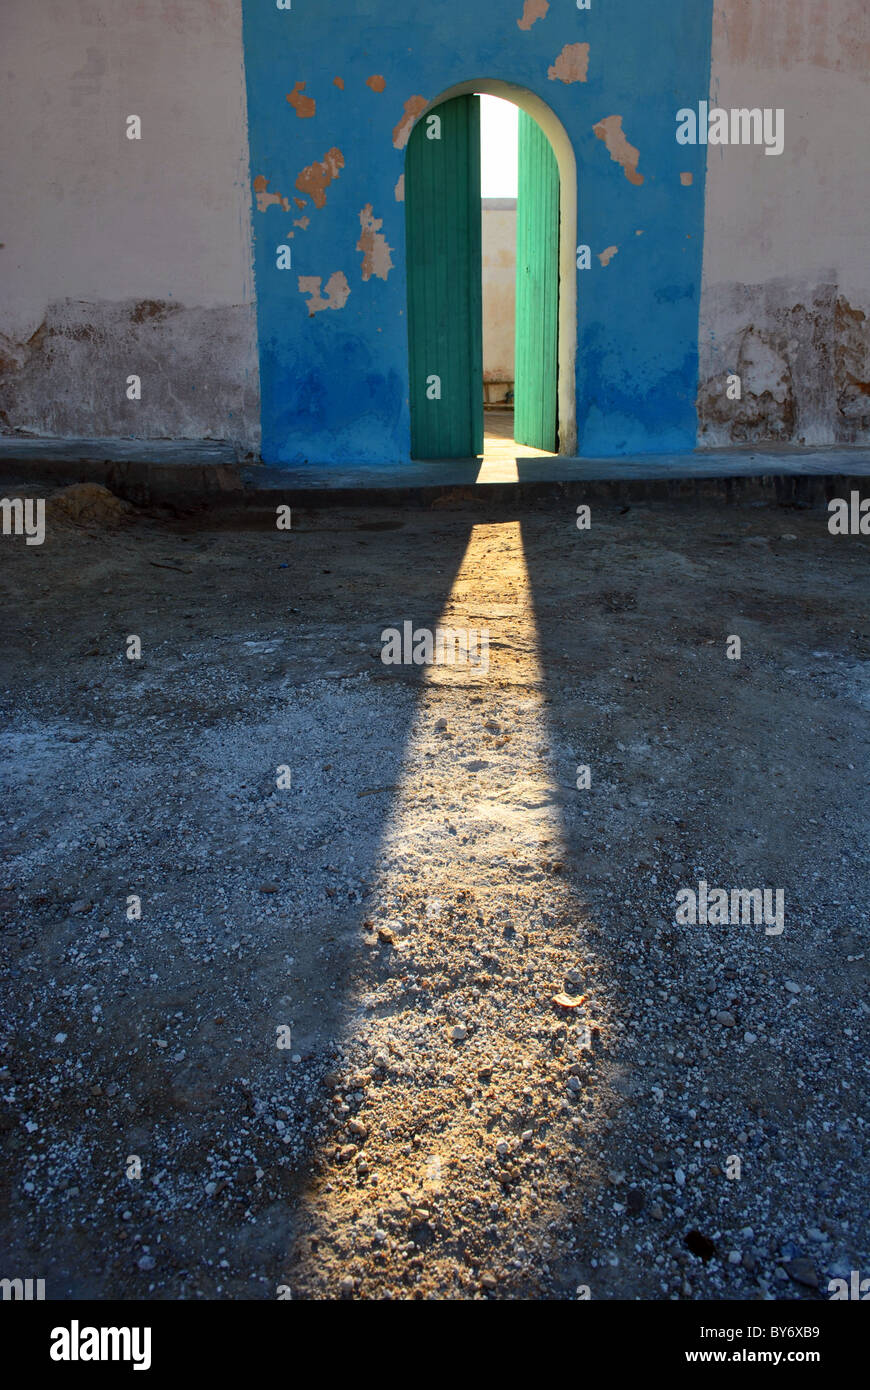 Sunlight streaming through an open door, Tunisia Stock Photo